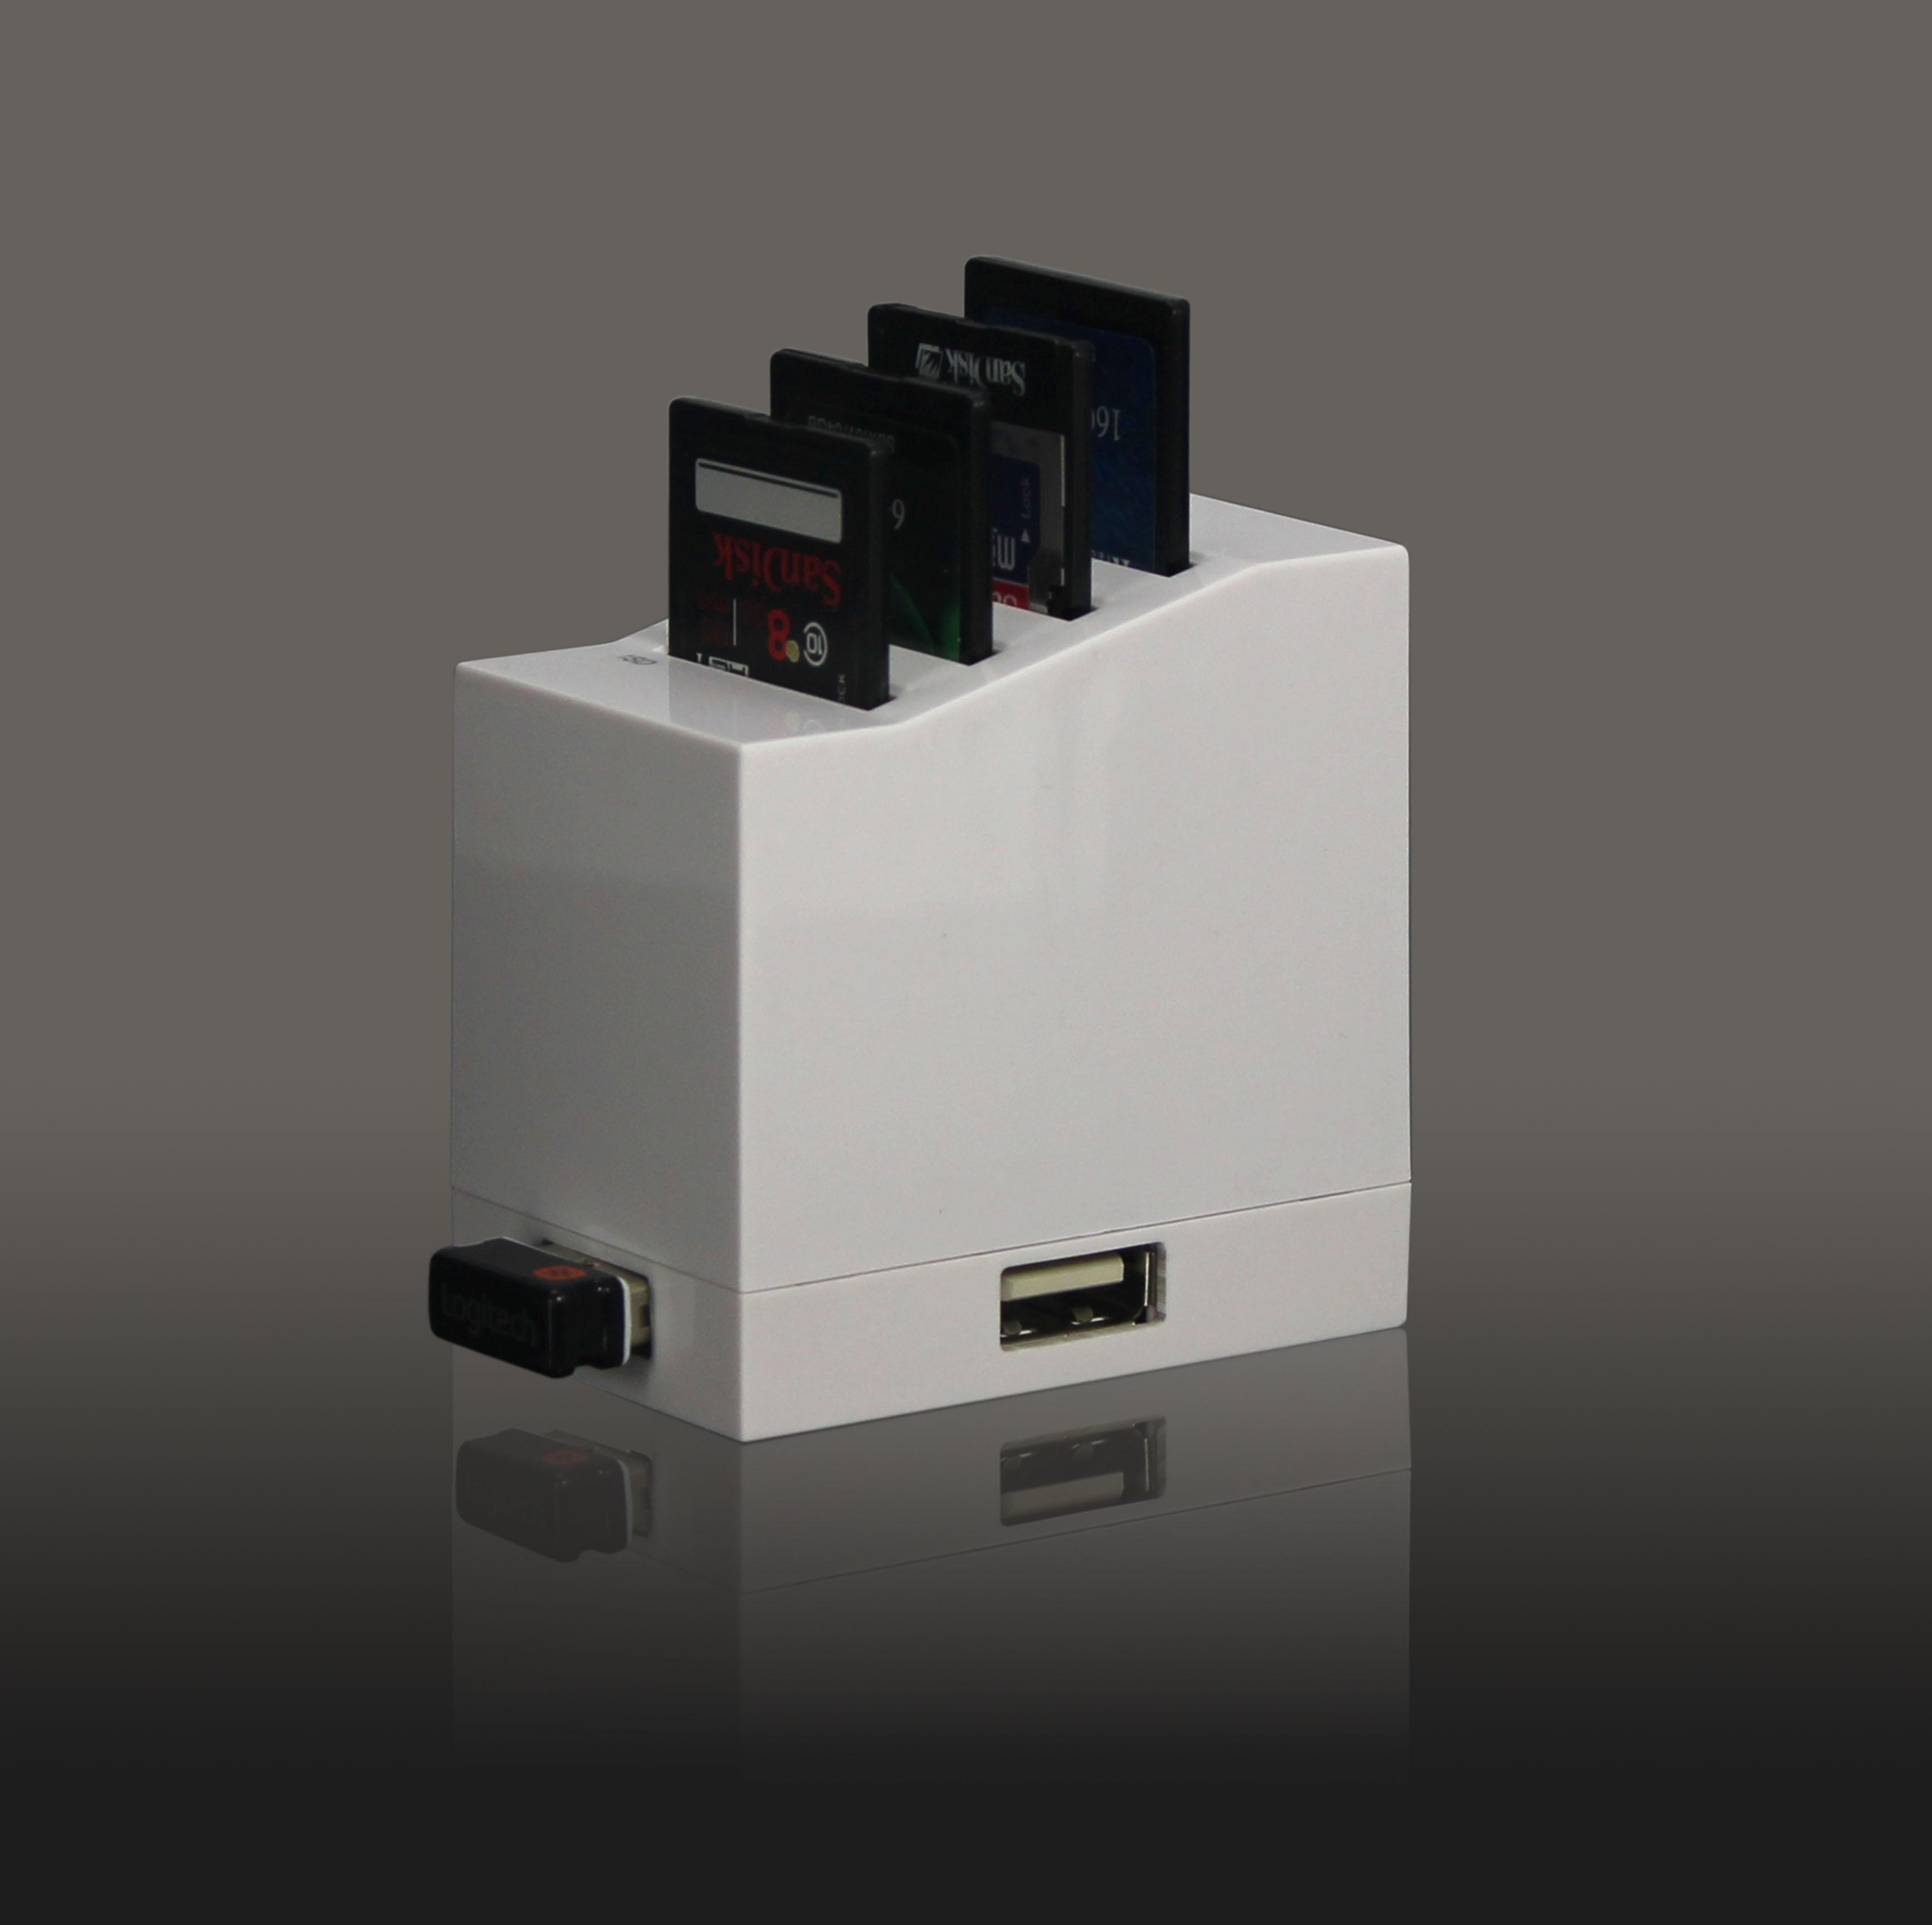 4 port SD card reader+usb 3 port hub - USBSKY   USBSKY.NET